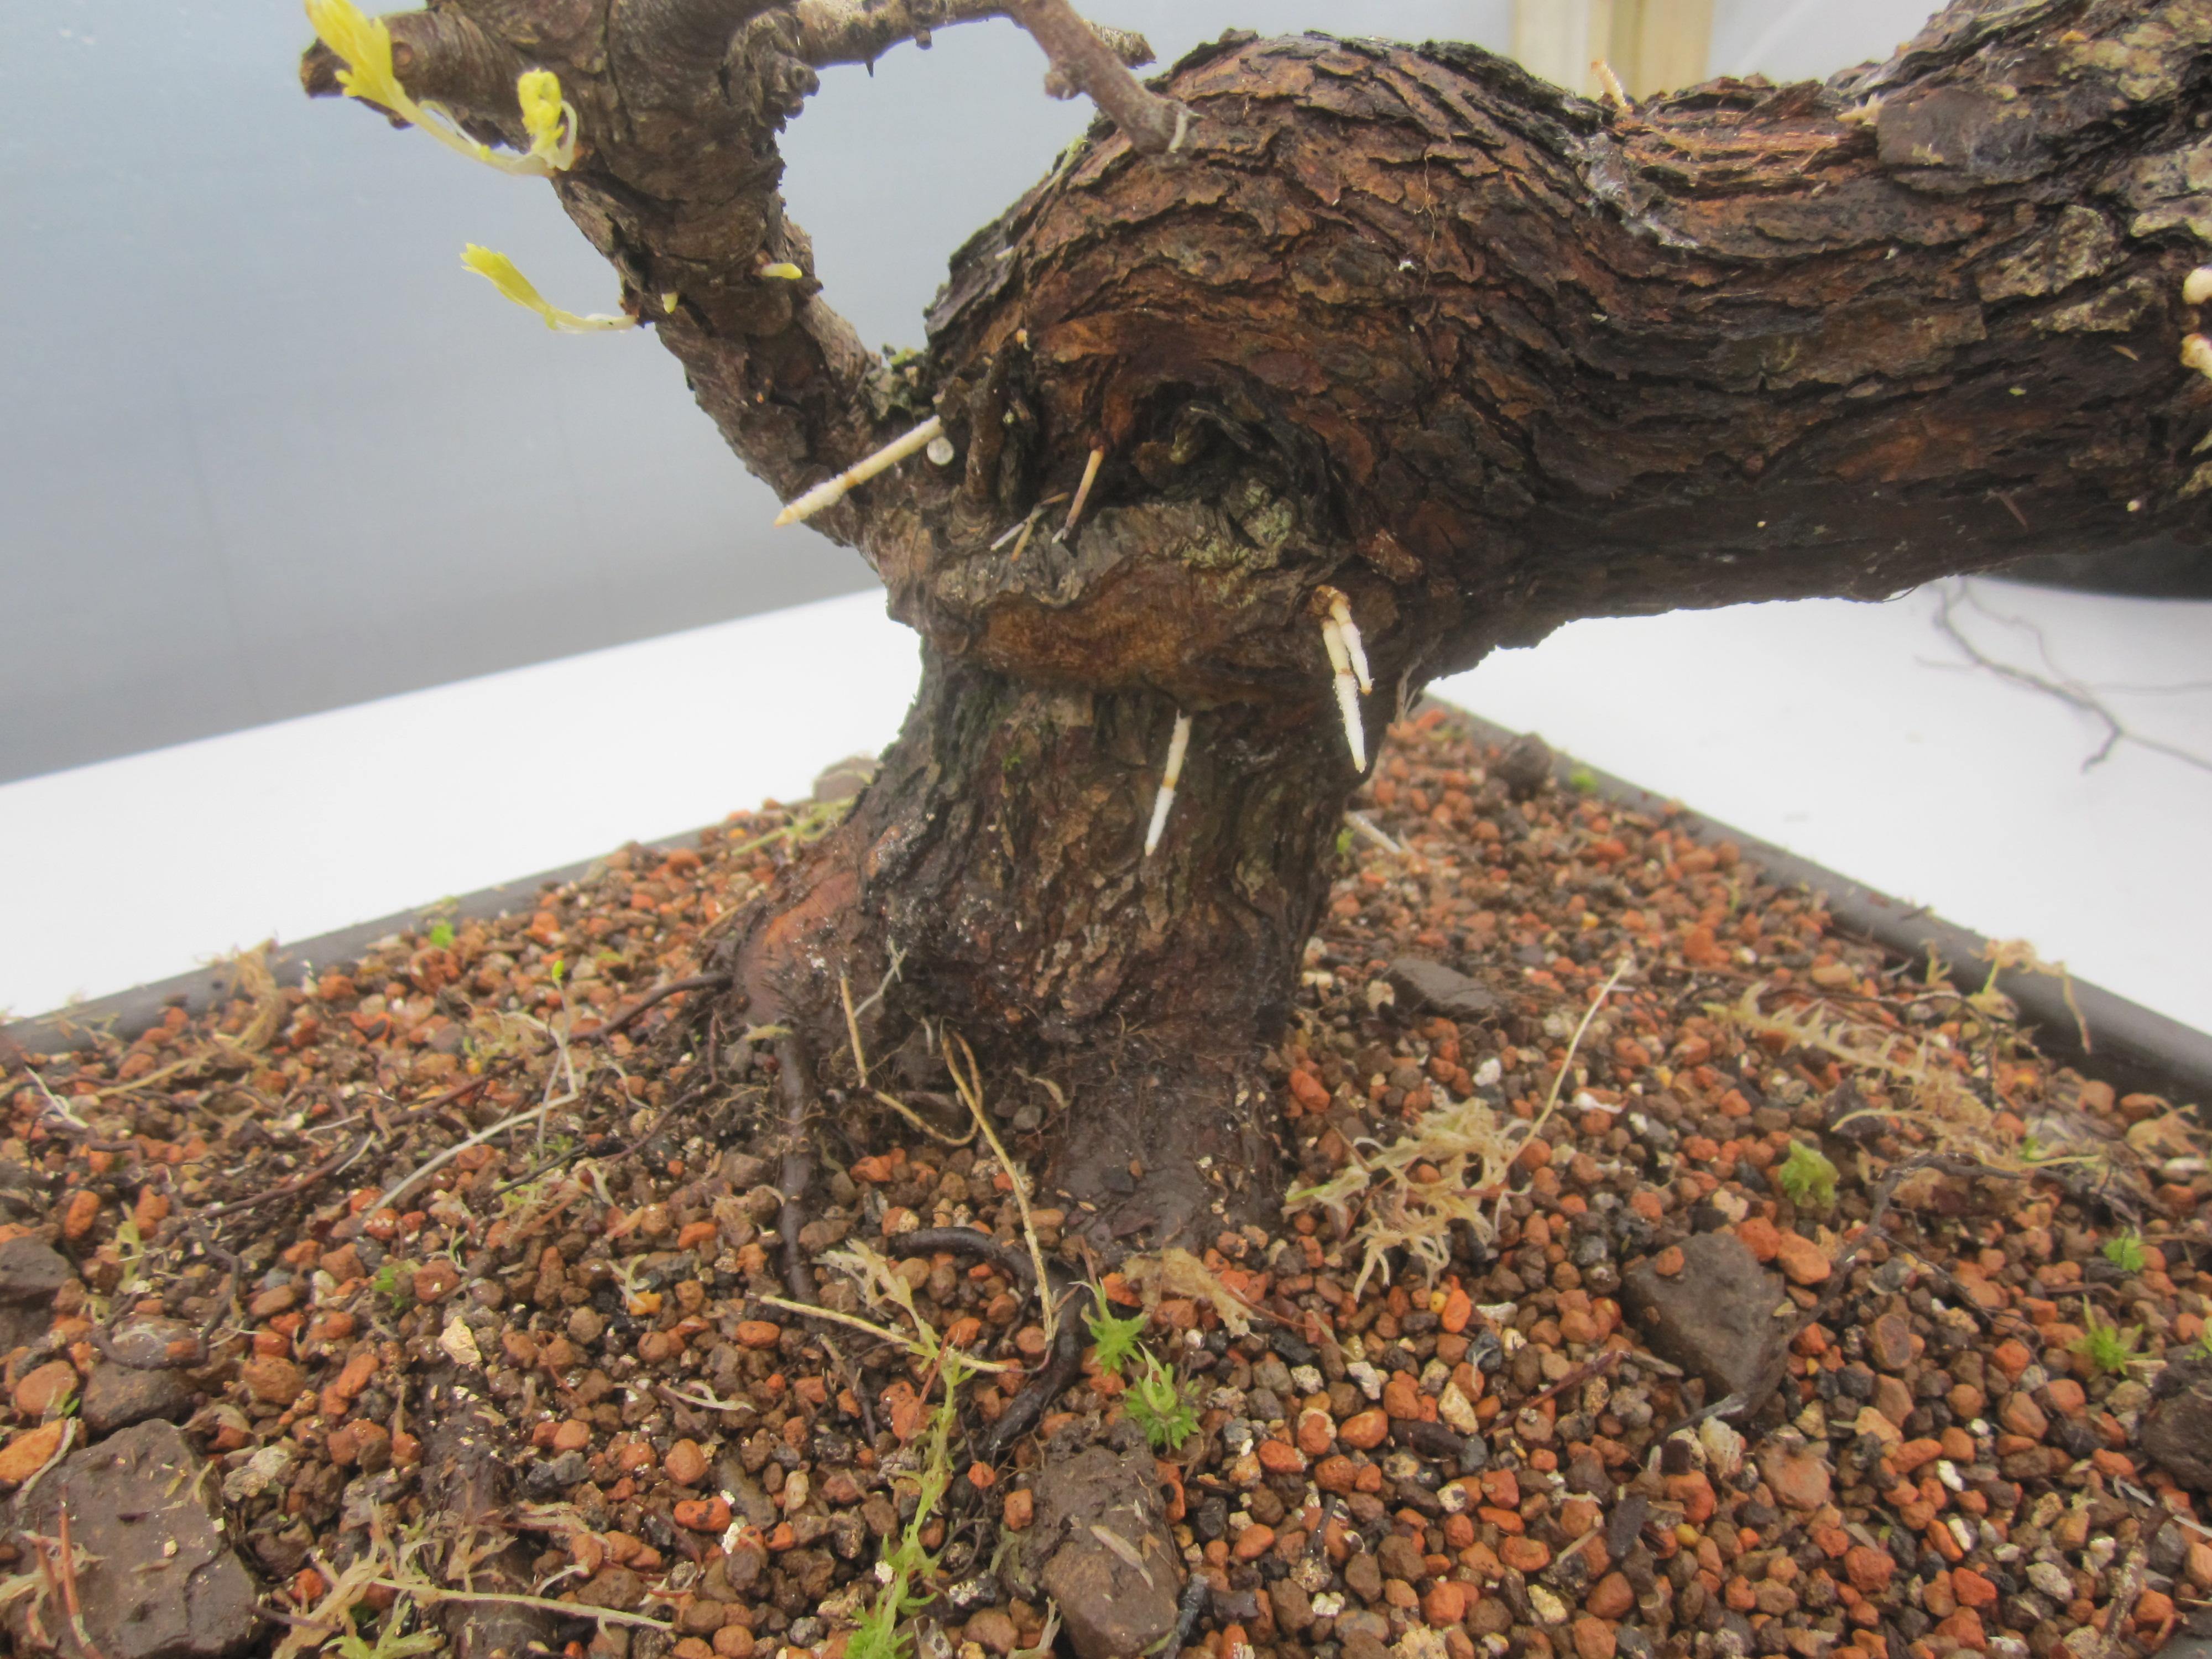 Bonsai Techniques Yamadori From Tony Tickle Wiring Yew Prunus Spinosa And Crataegustonyticklecrataegus Rootsprunus New Roots Direct The Old Trunkprunus Crataegus